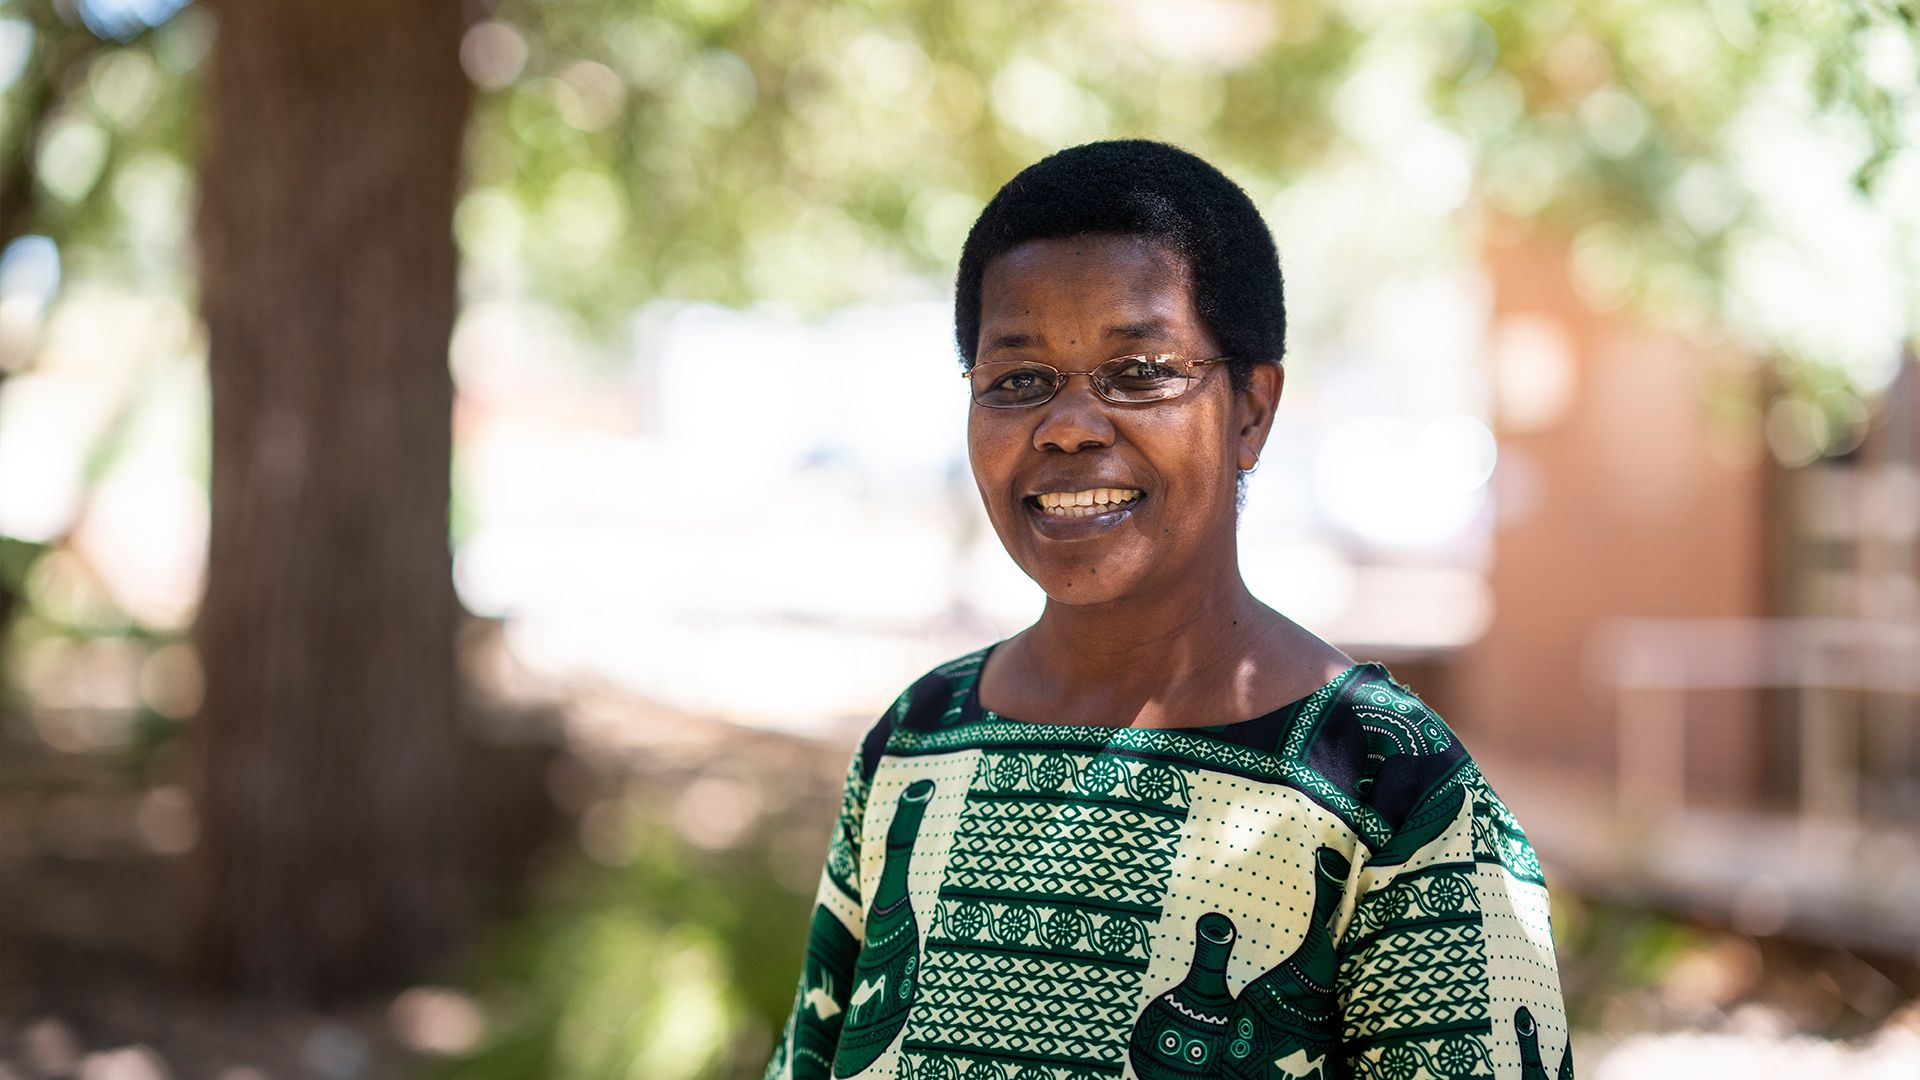 Research reveals racial discrimination of black sub-Saharan African nurses in rural Australia